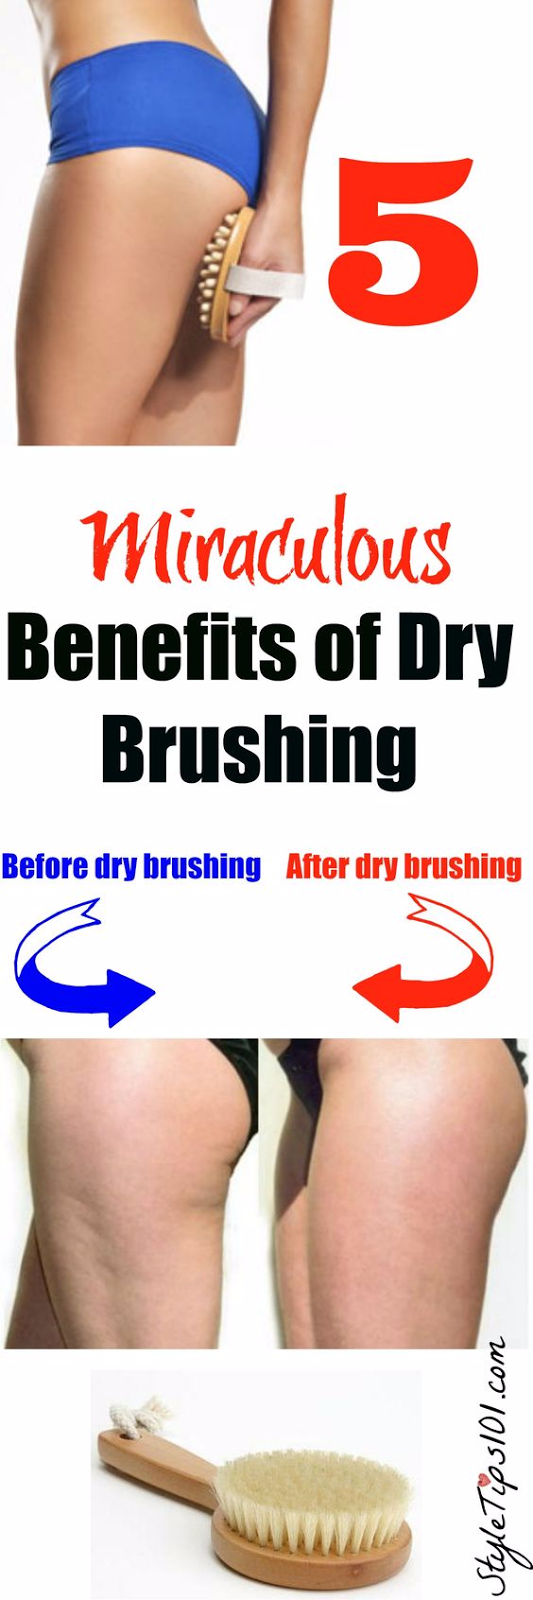 5 BENEFITS OF DRY BRUSHING